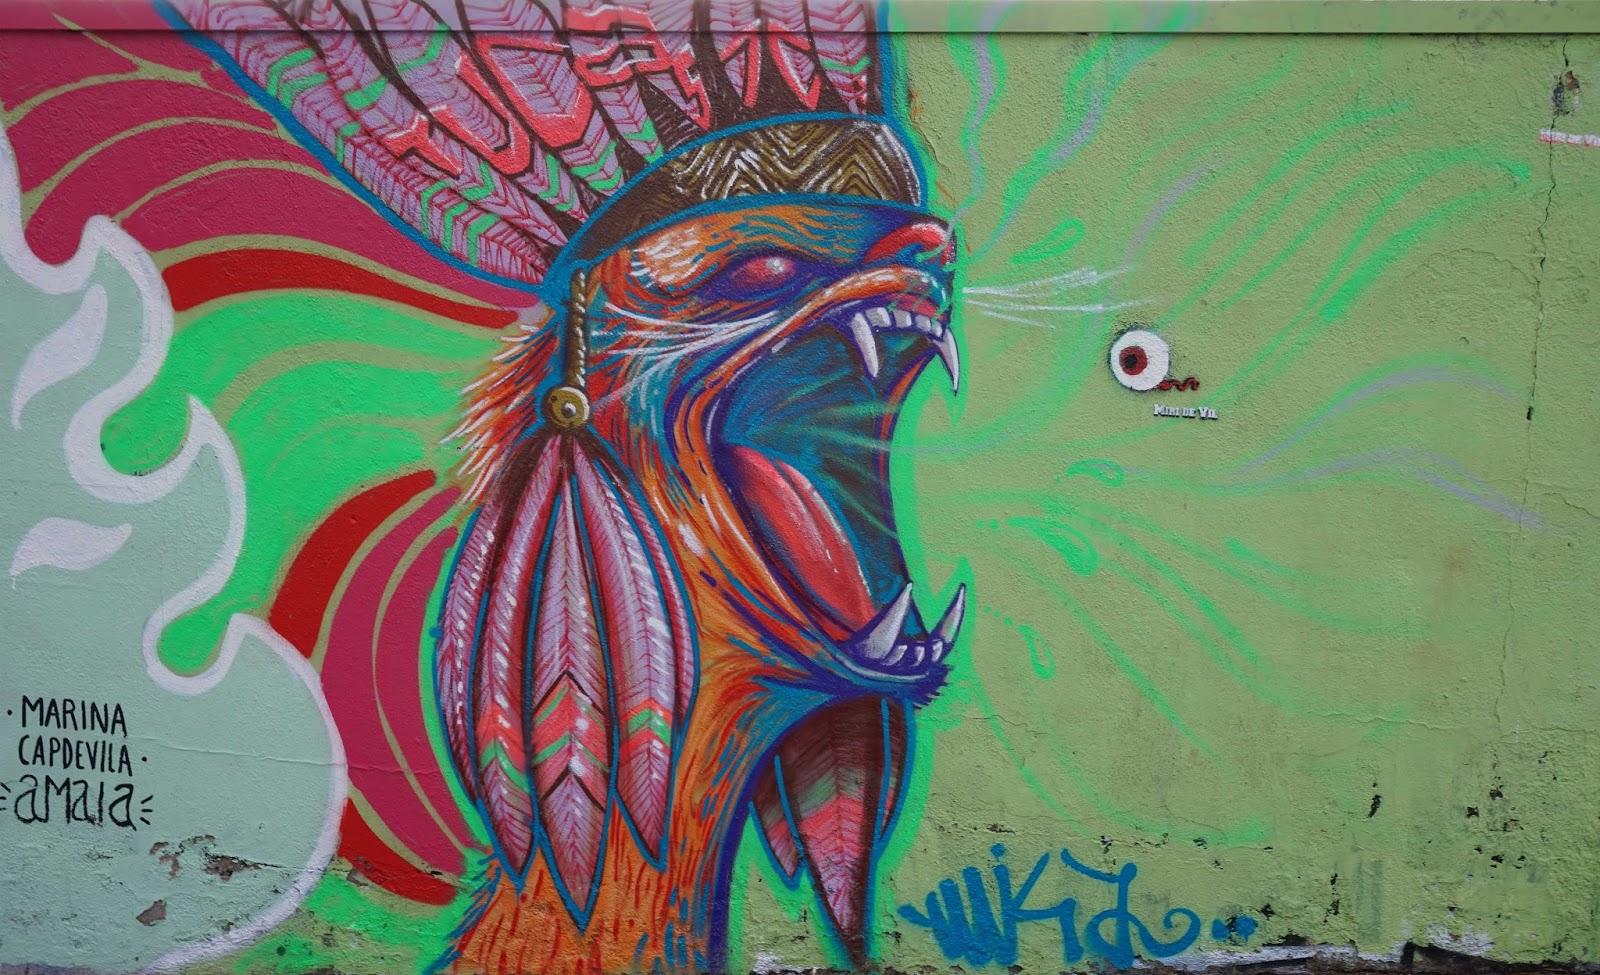 Barcelona Street Art - Feathered Lizard